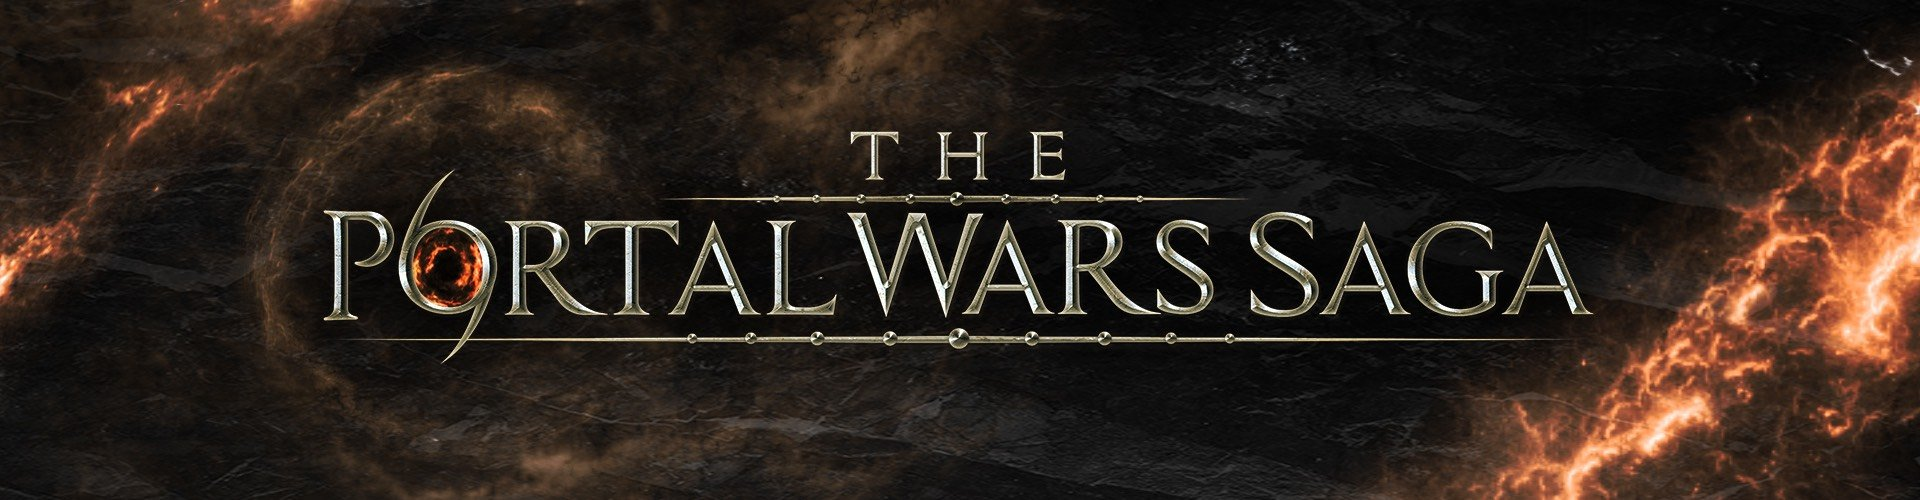 The Portal Wars Saga 1920×500